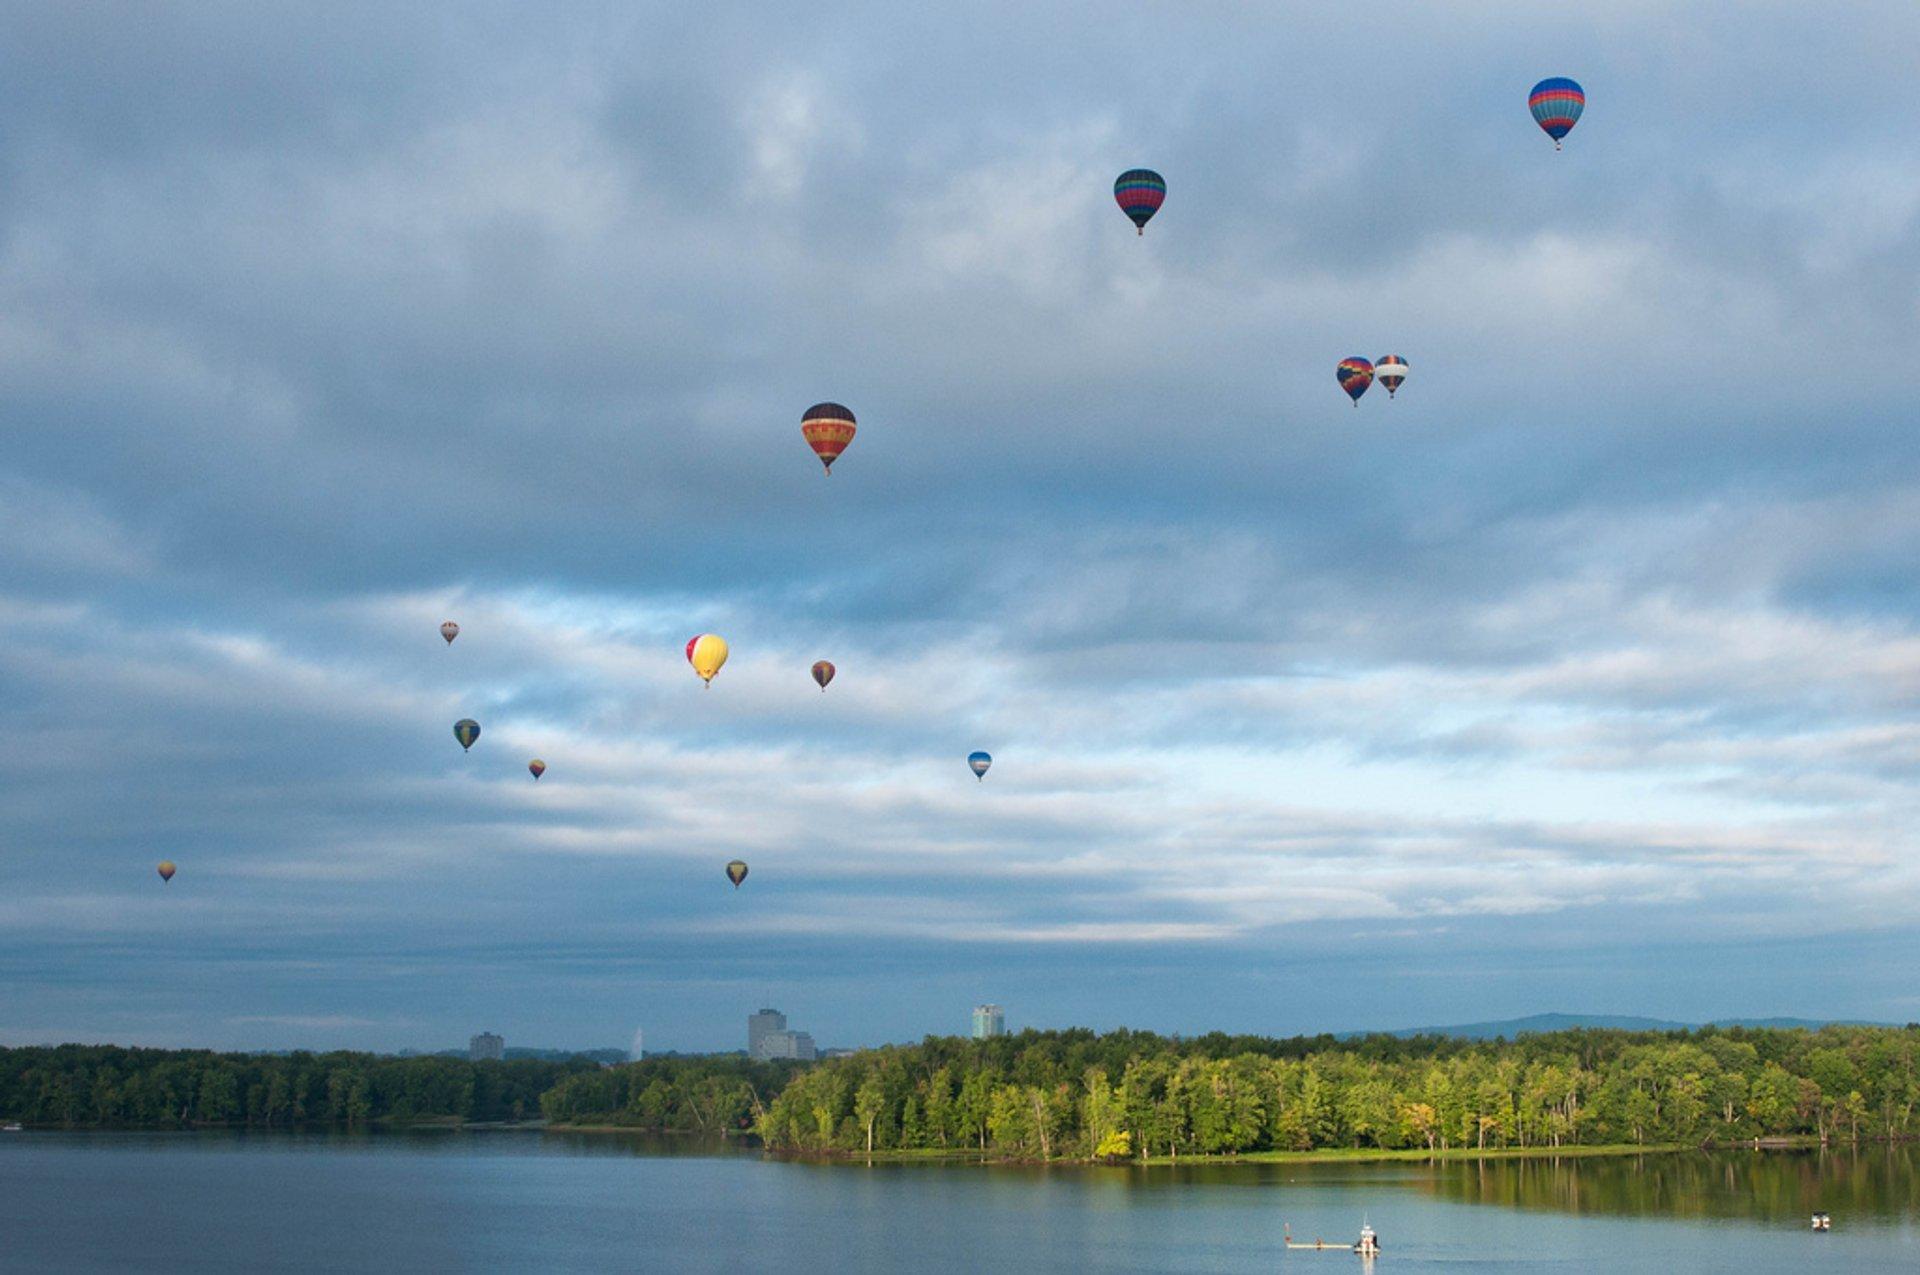 Best time for Gatineau Hot Air Balloon Festival in Ottawa 2019